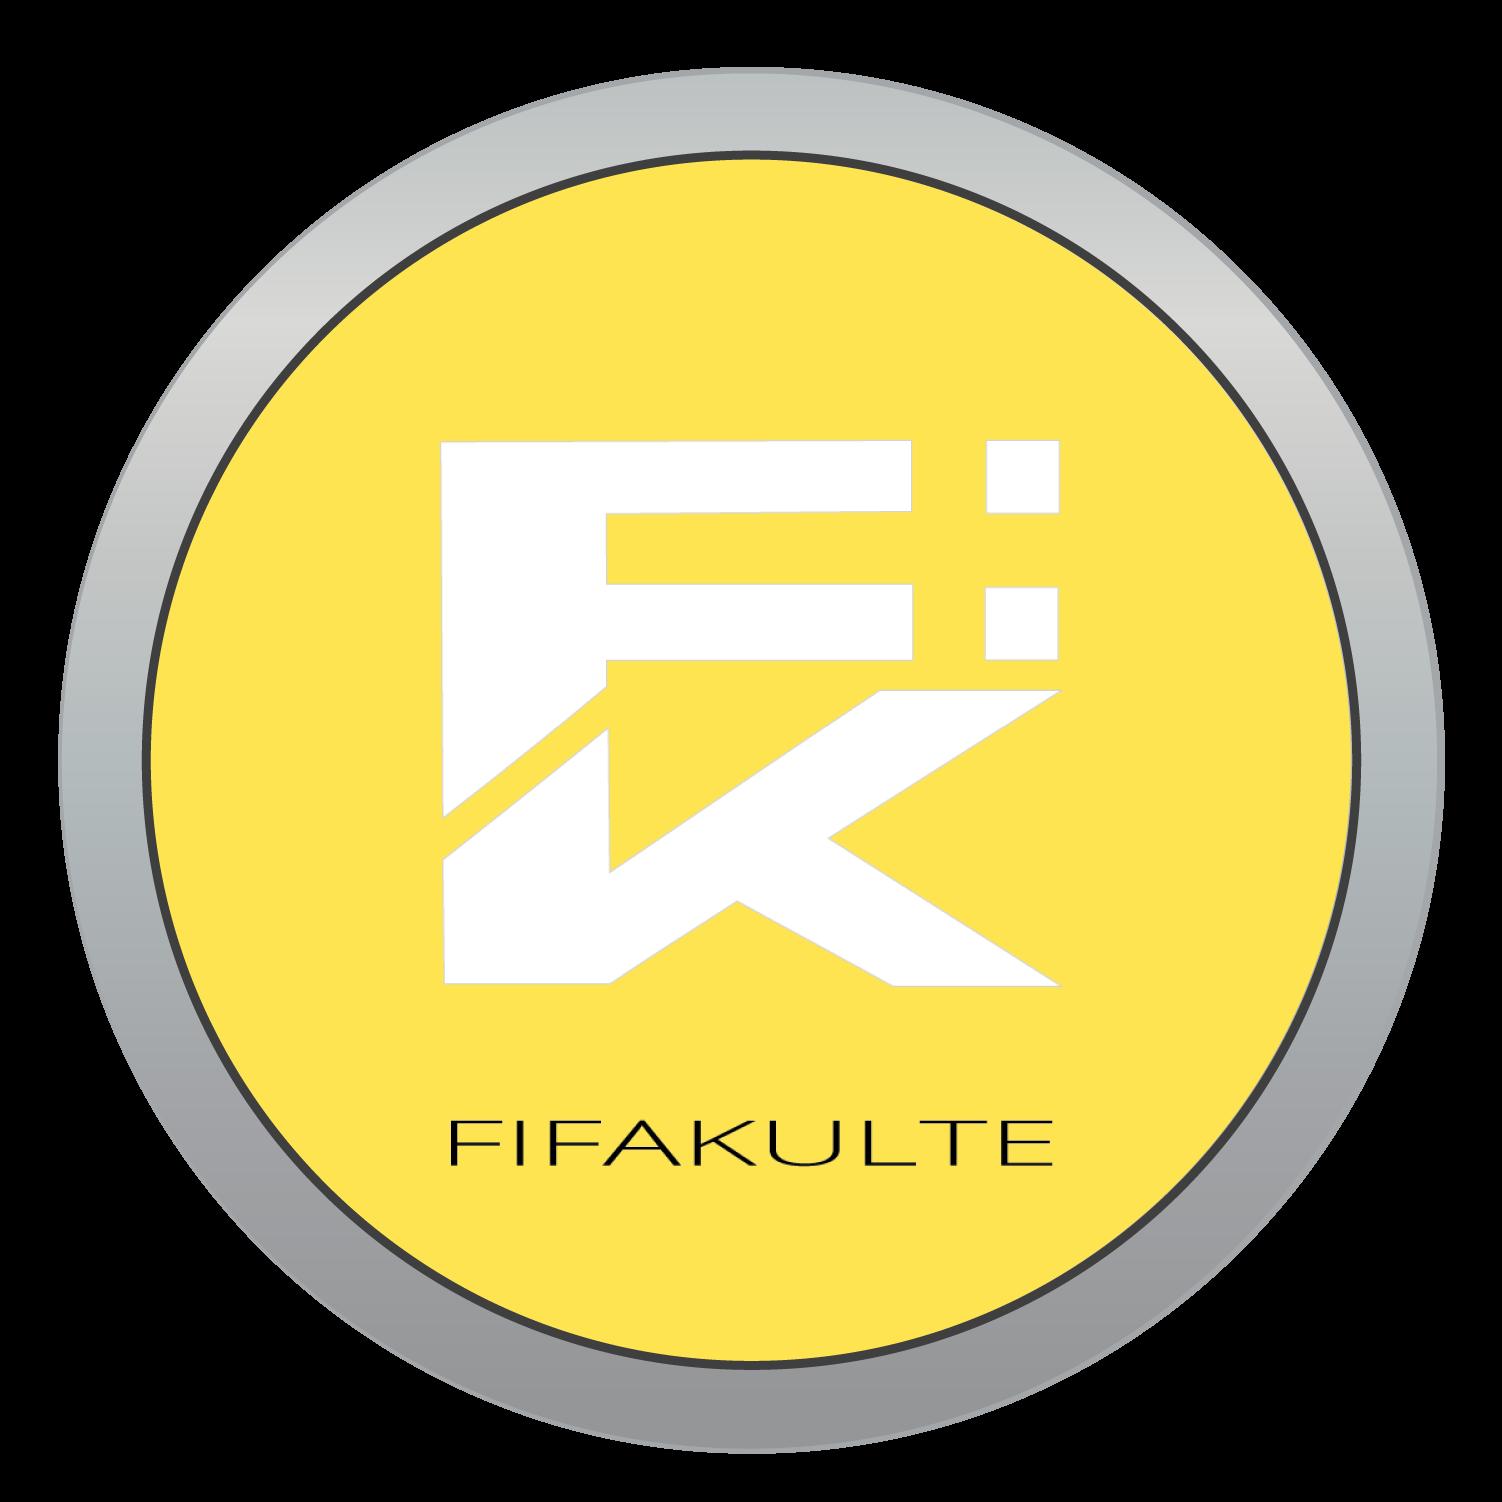 FIFAKULTE